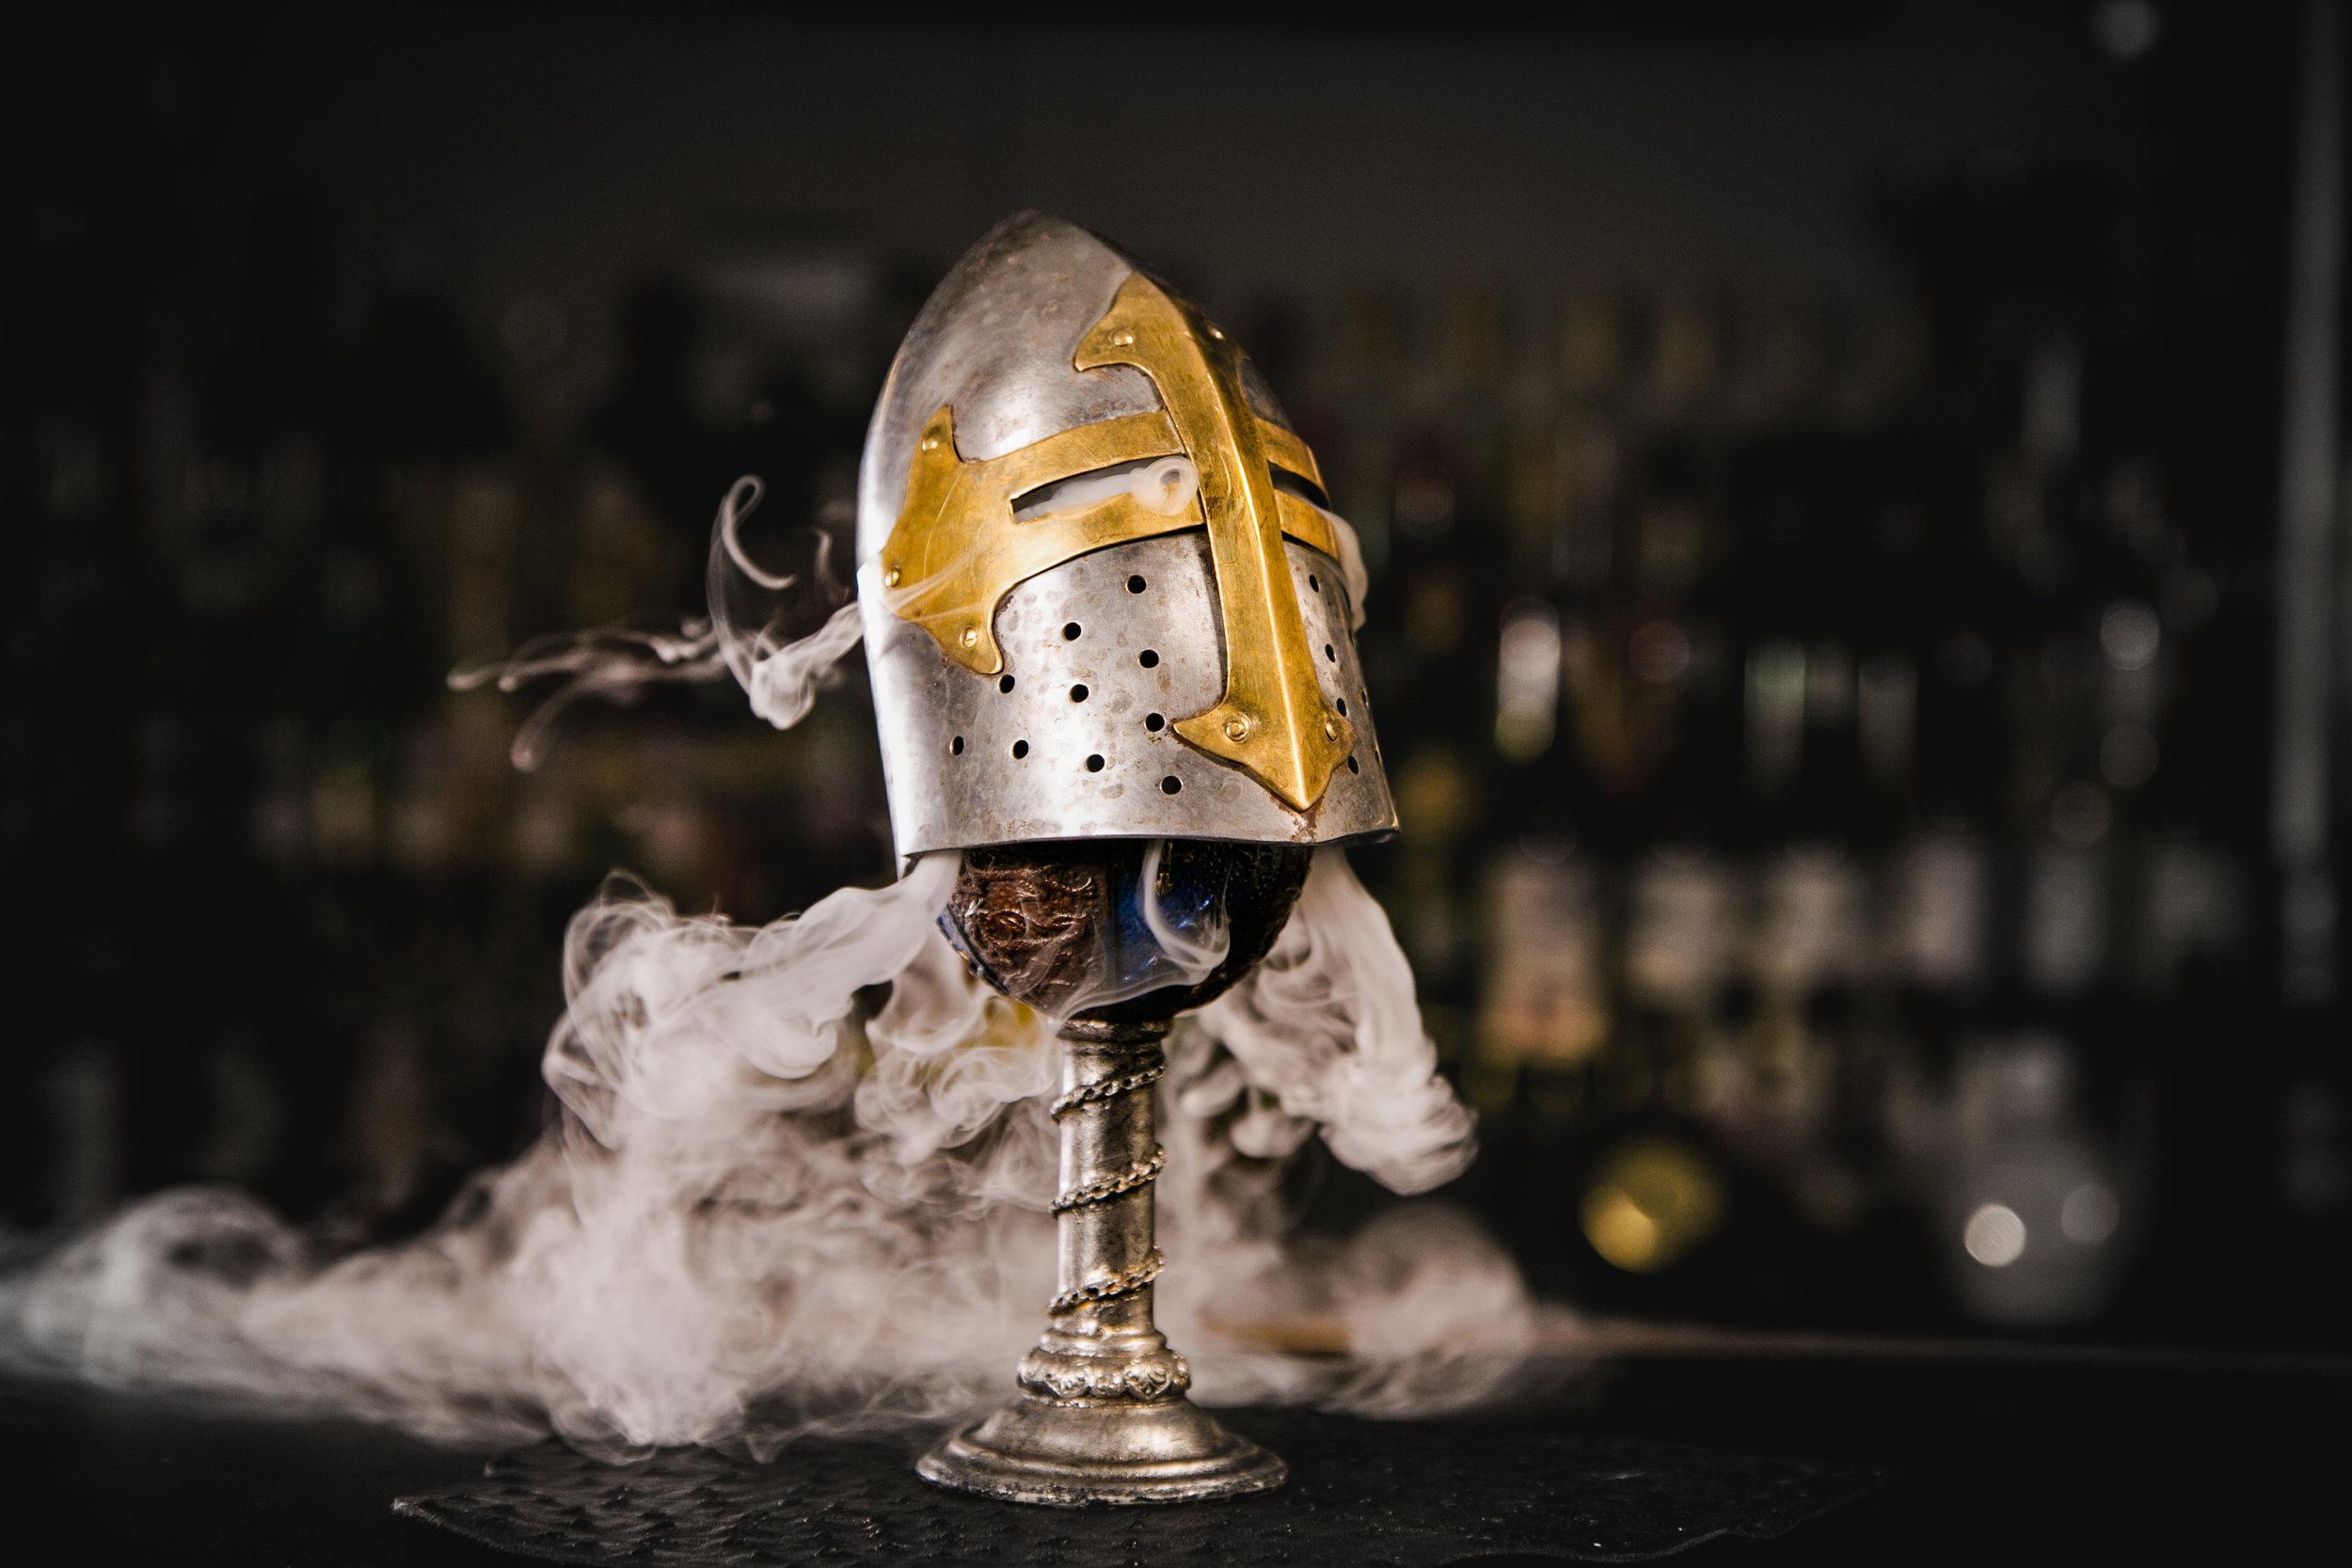 麵包騎士 Breaded Knight